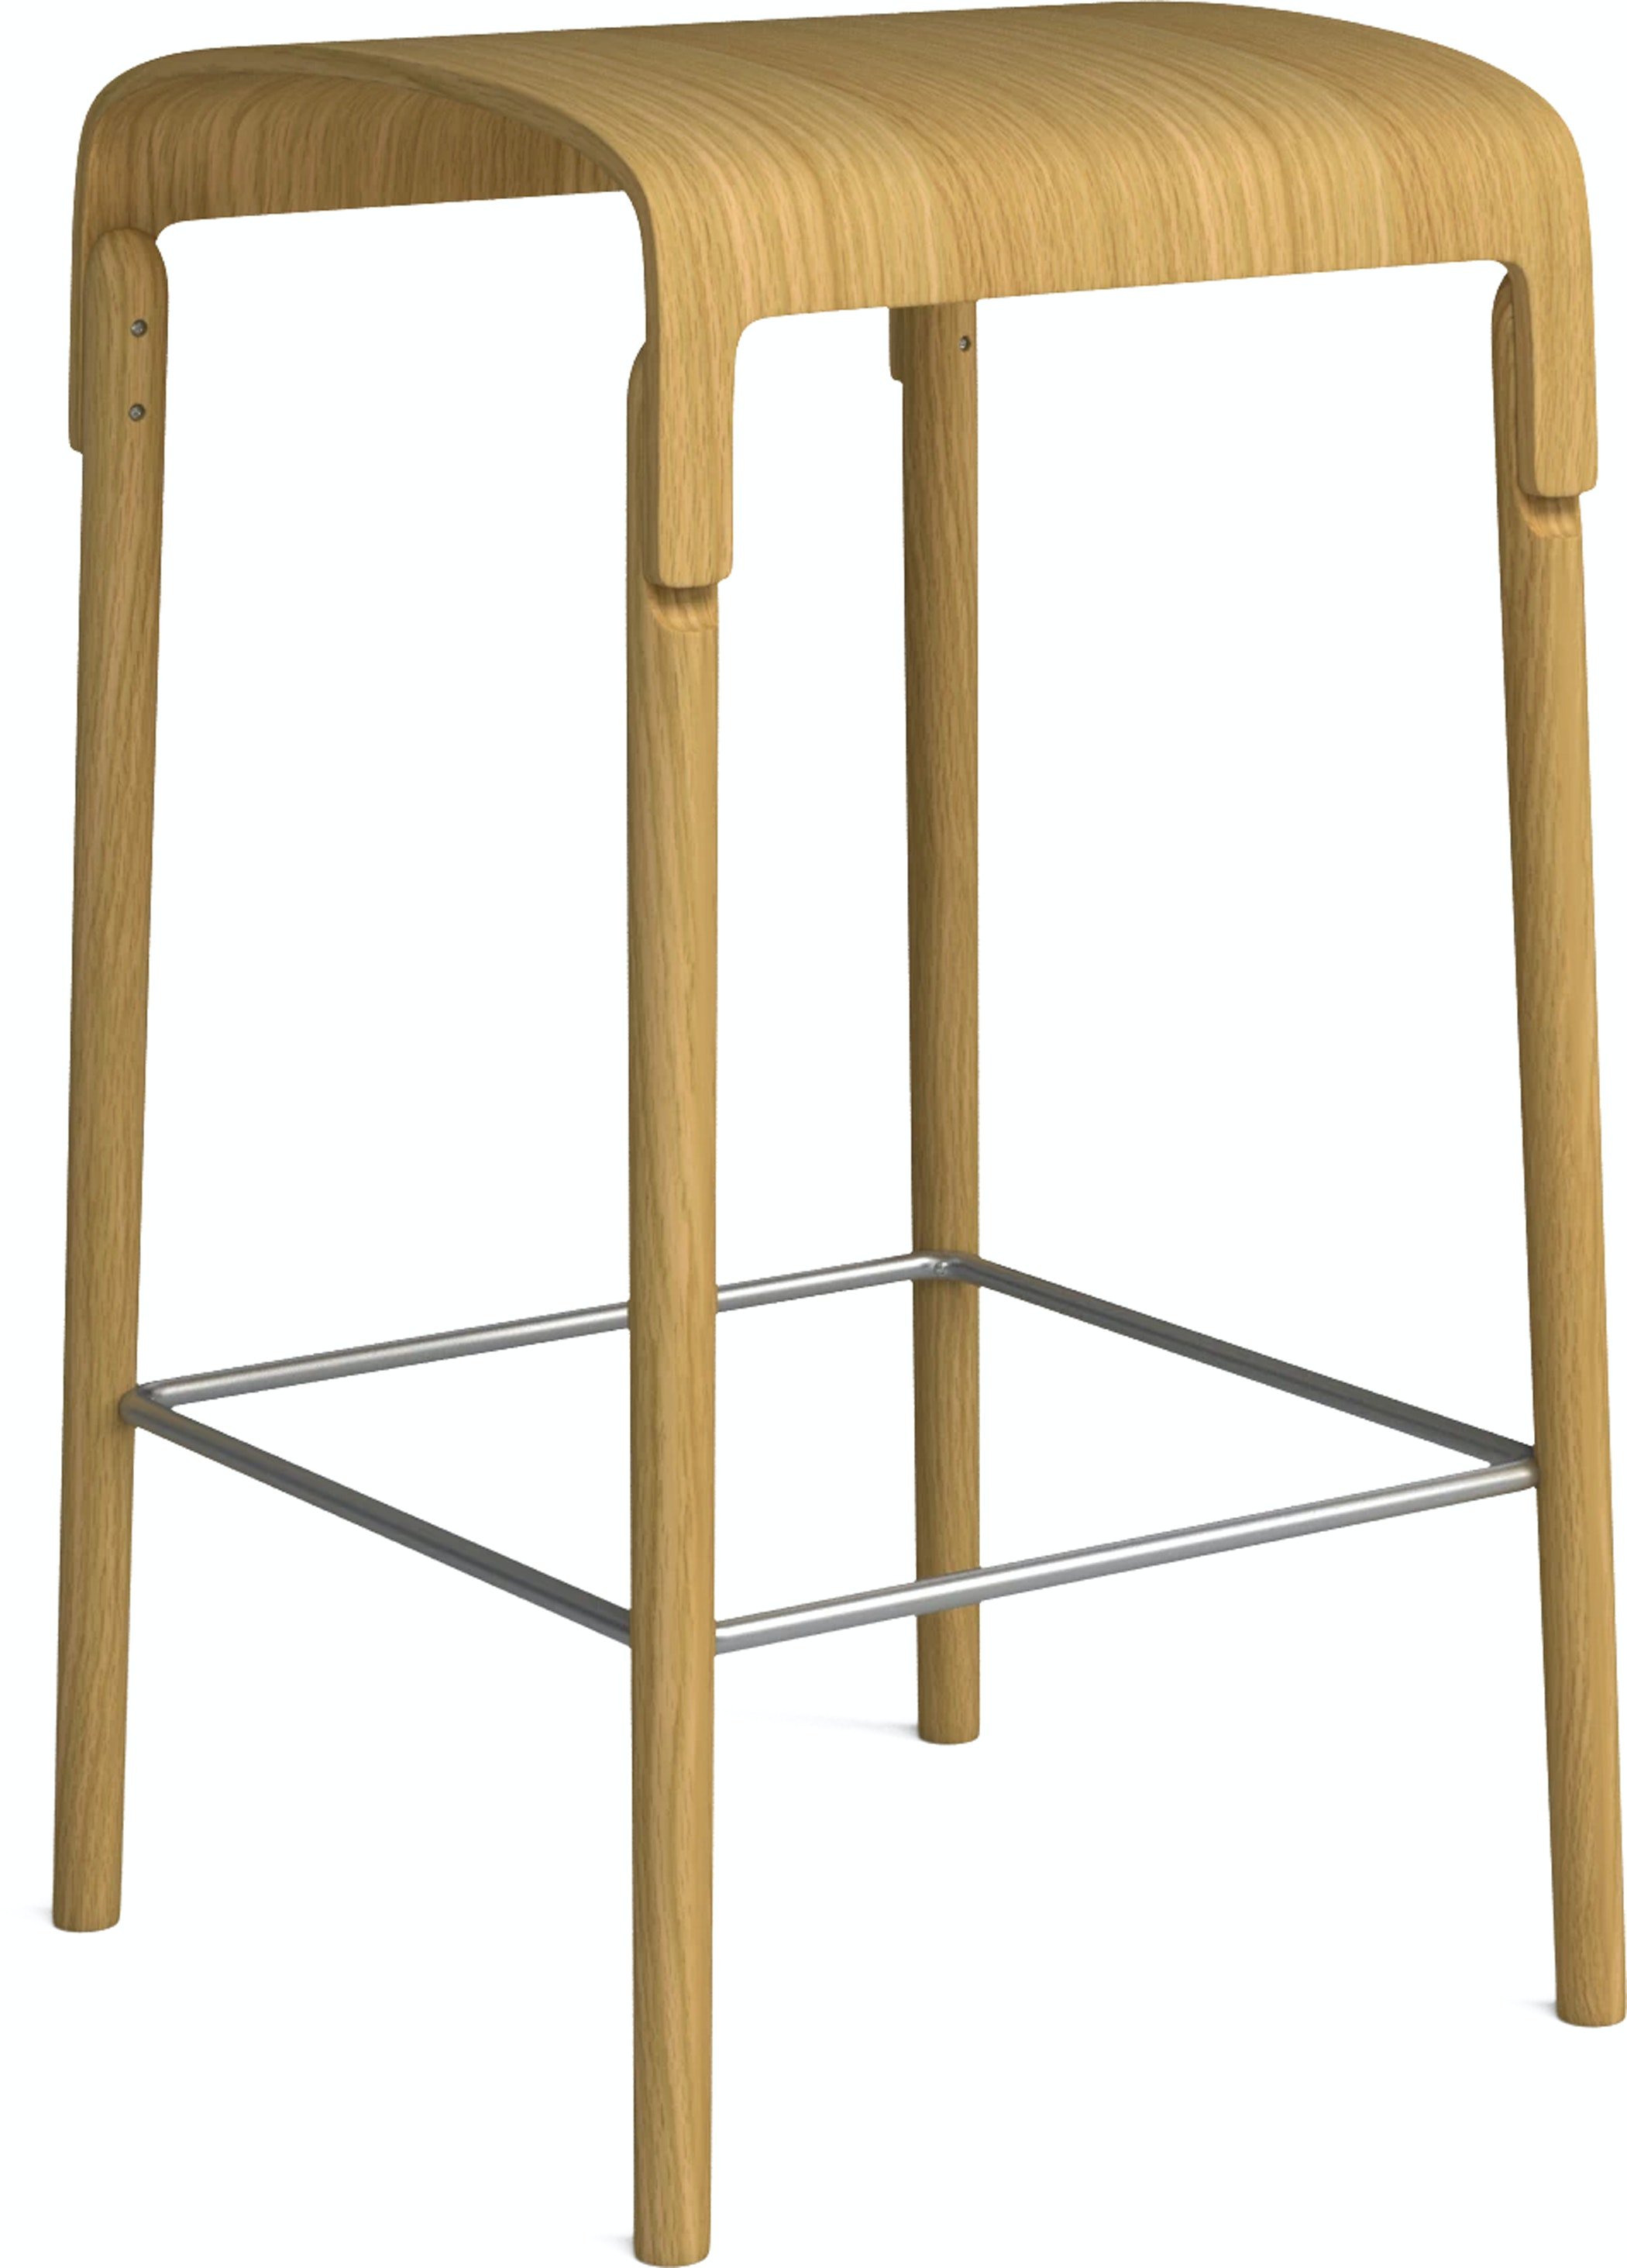 Stilt Stool 1